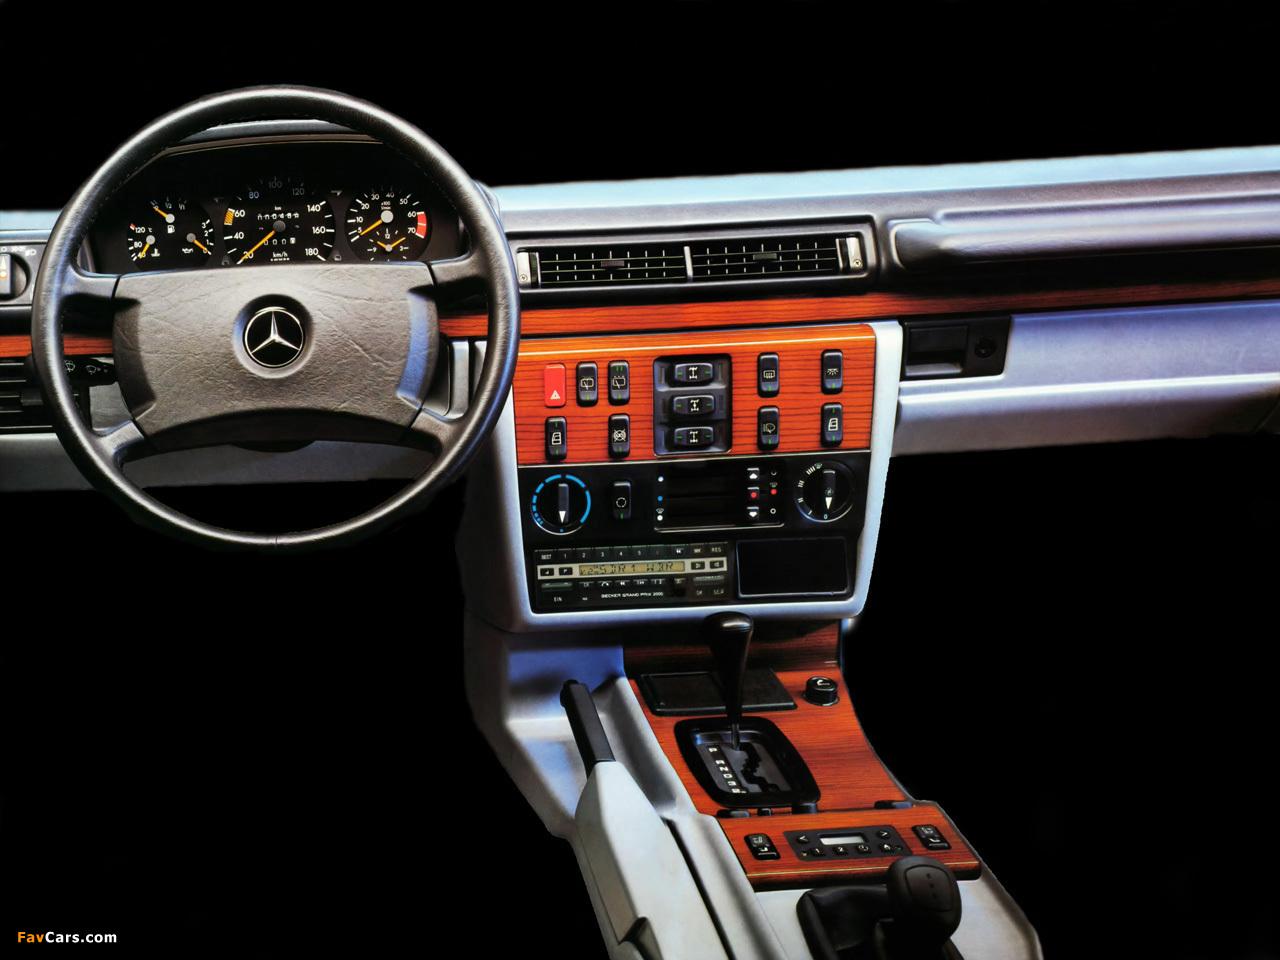 Mercedes benz g klasse lwb w461 1992 97 wallpapers for 97 mercedes benz